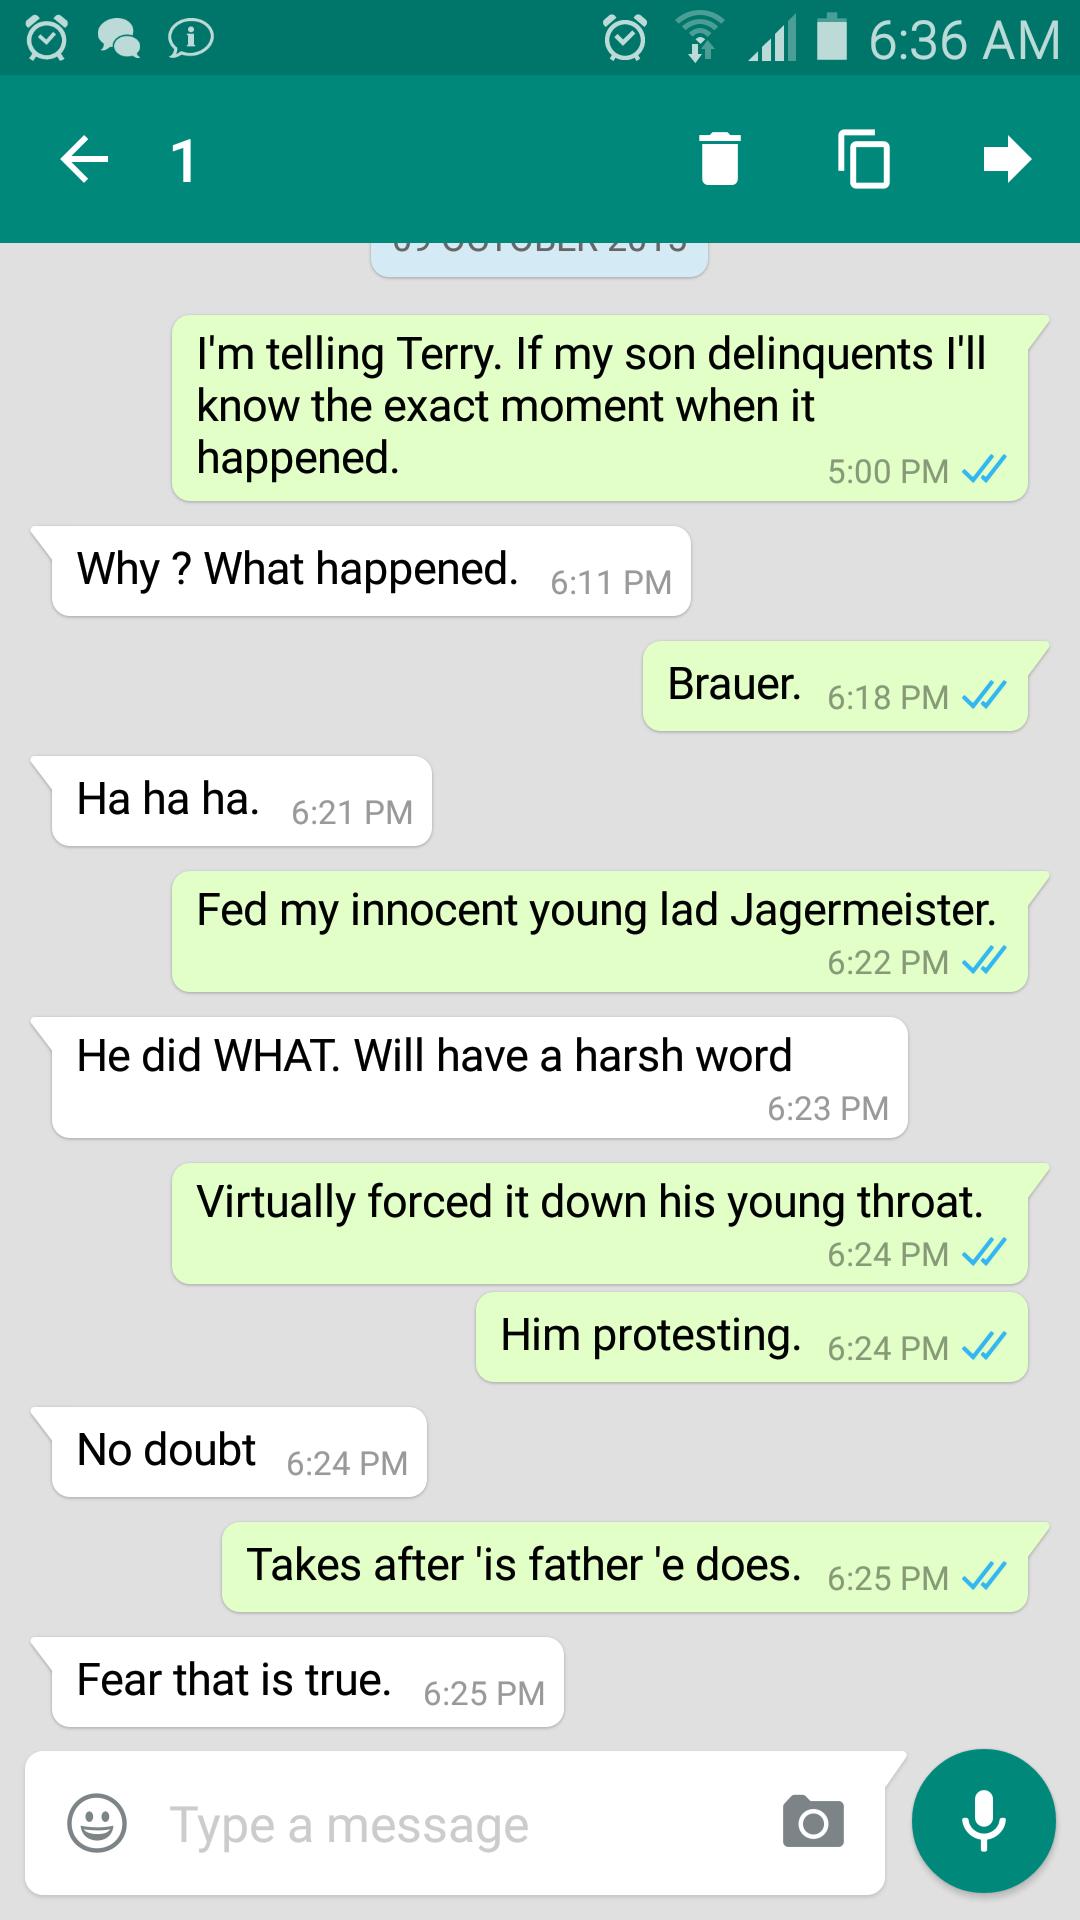 Brauermeister